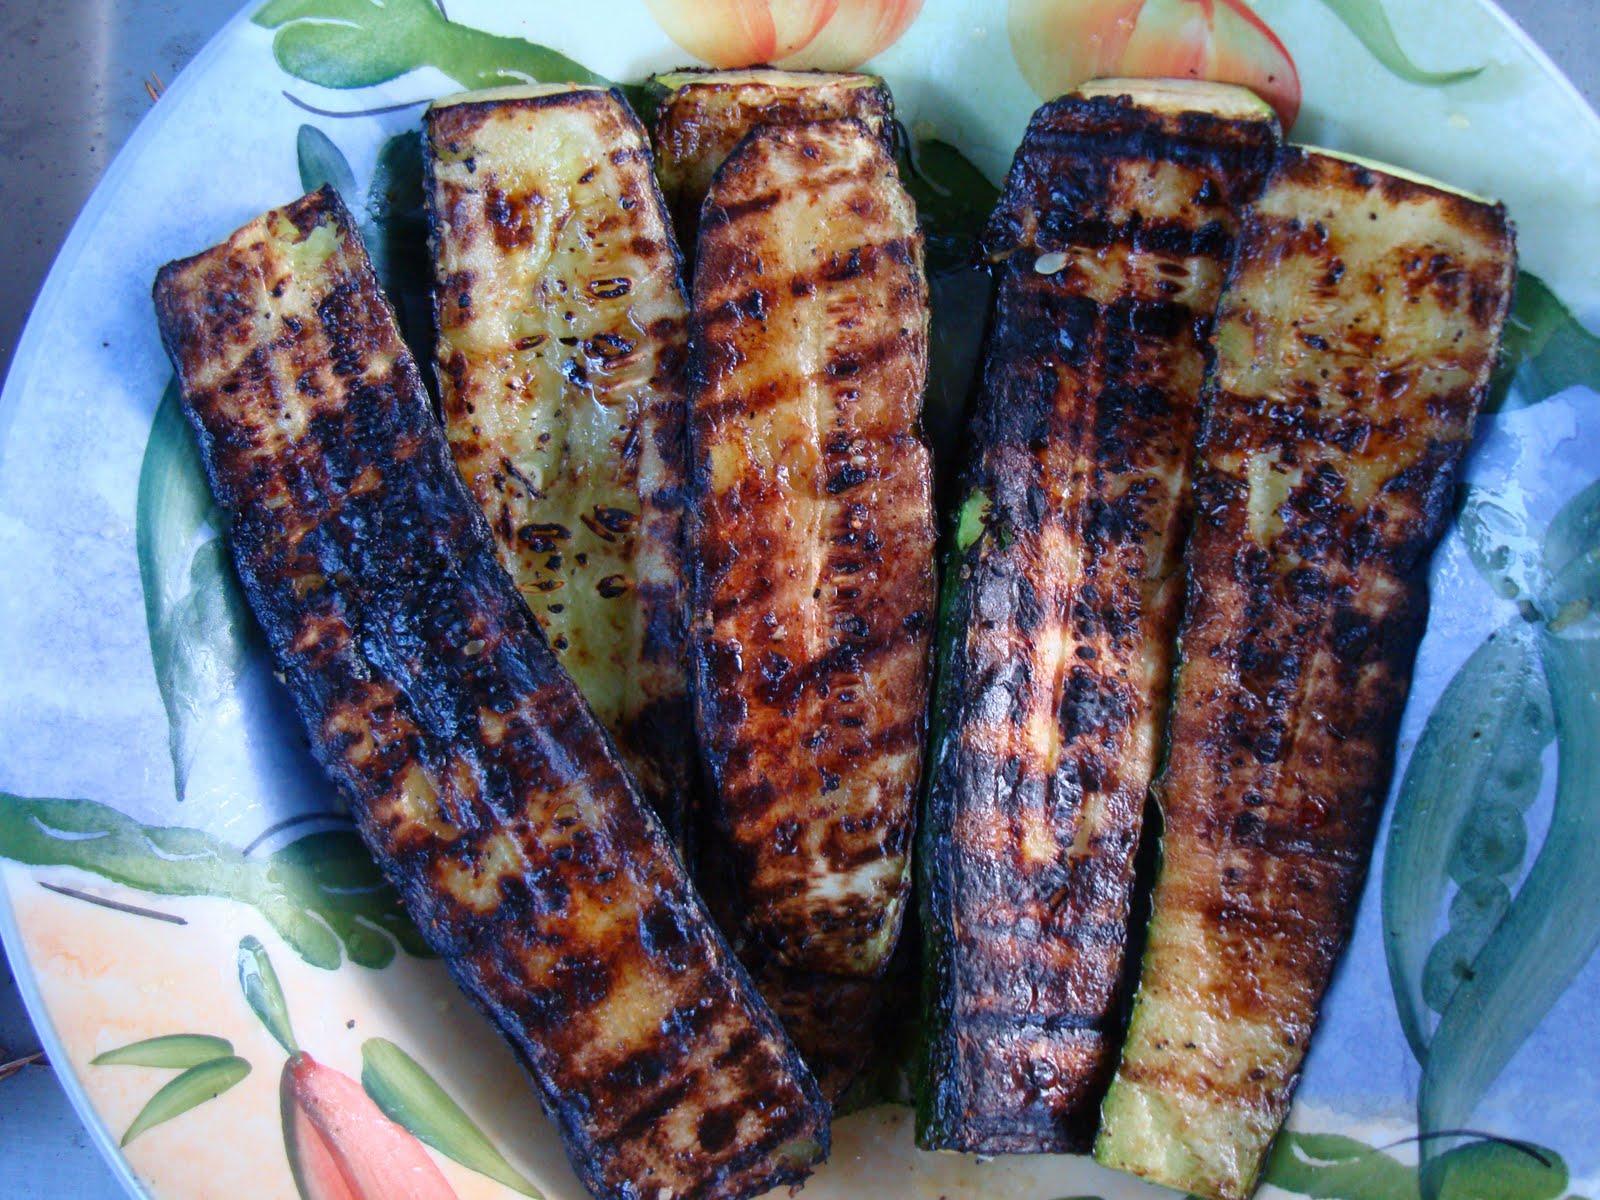 BBQDad1: Grilled bacon wrapped scallops, and garlic zucchini